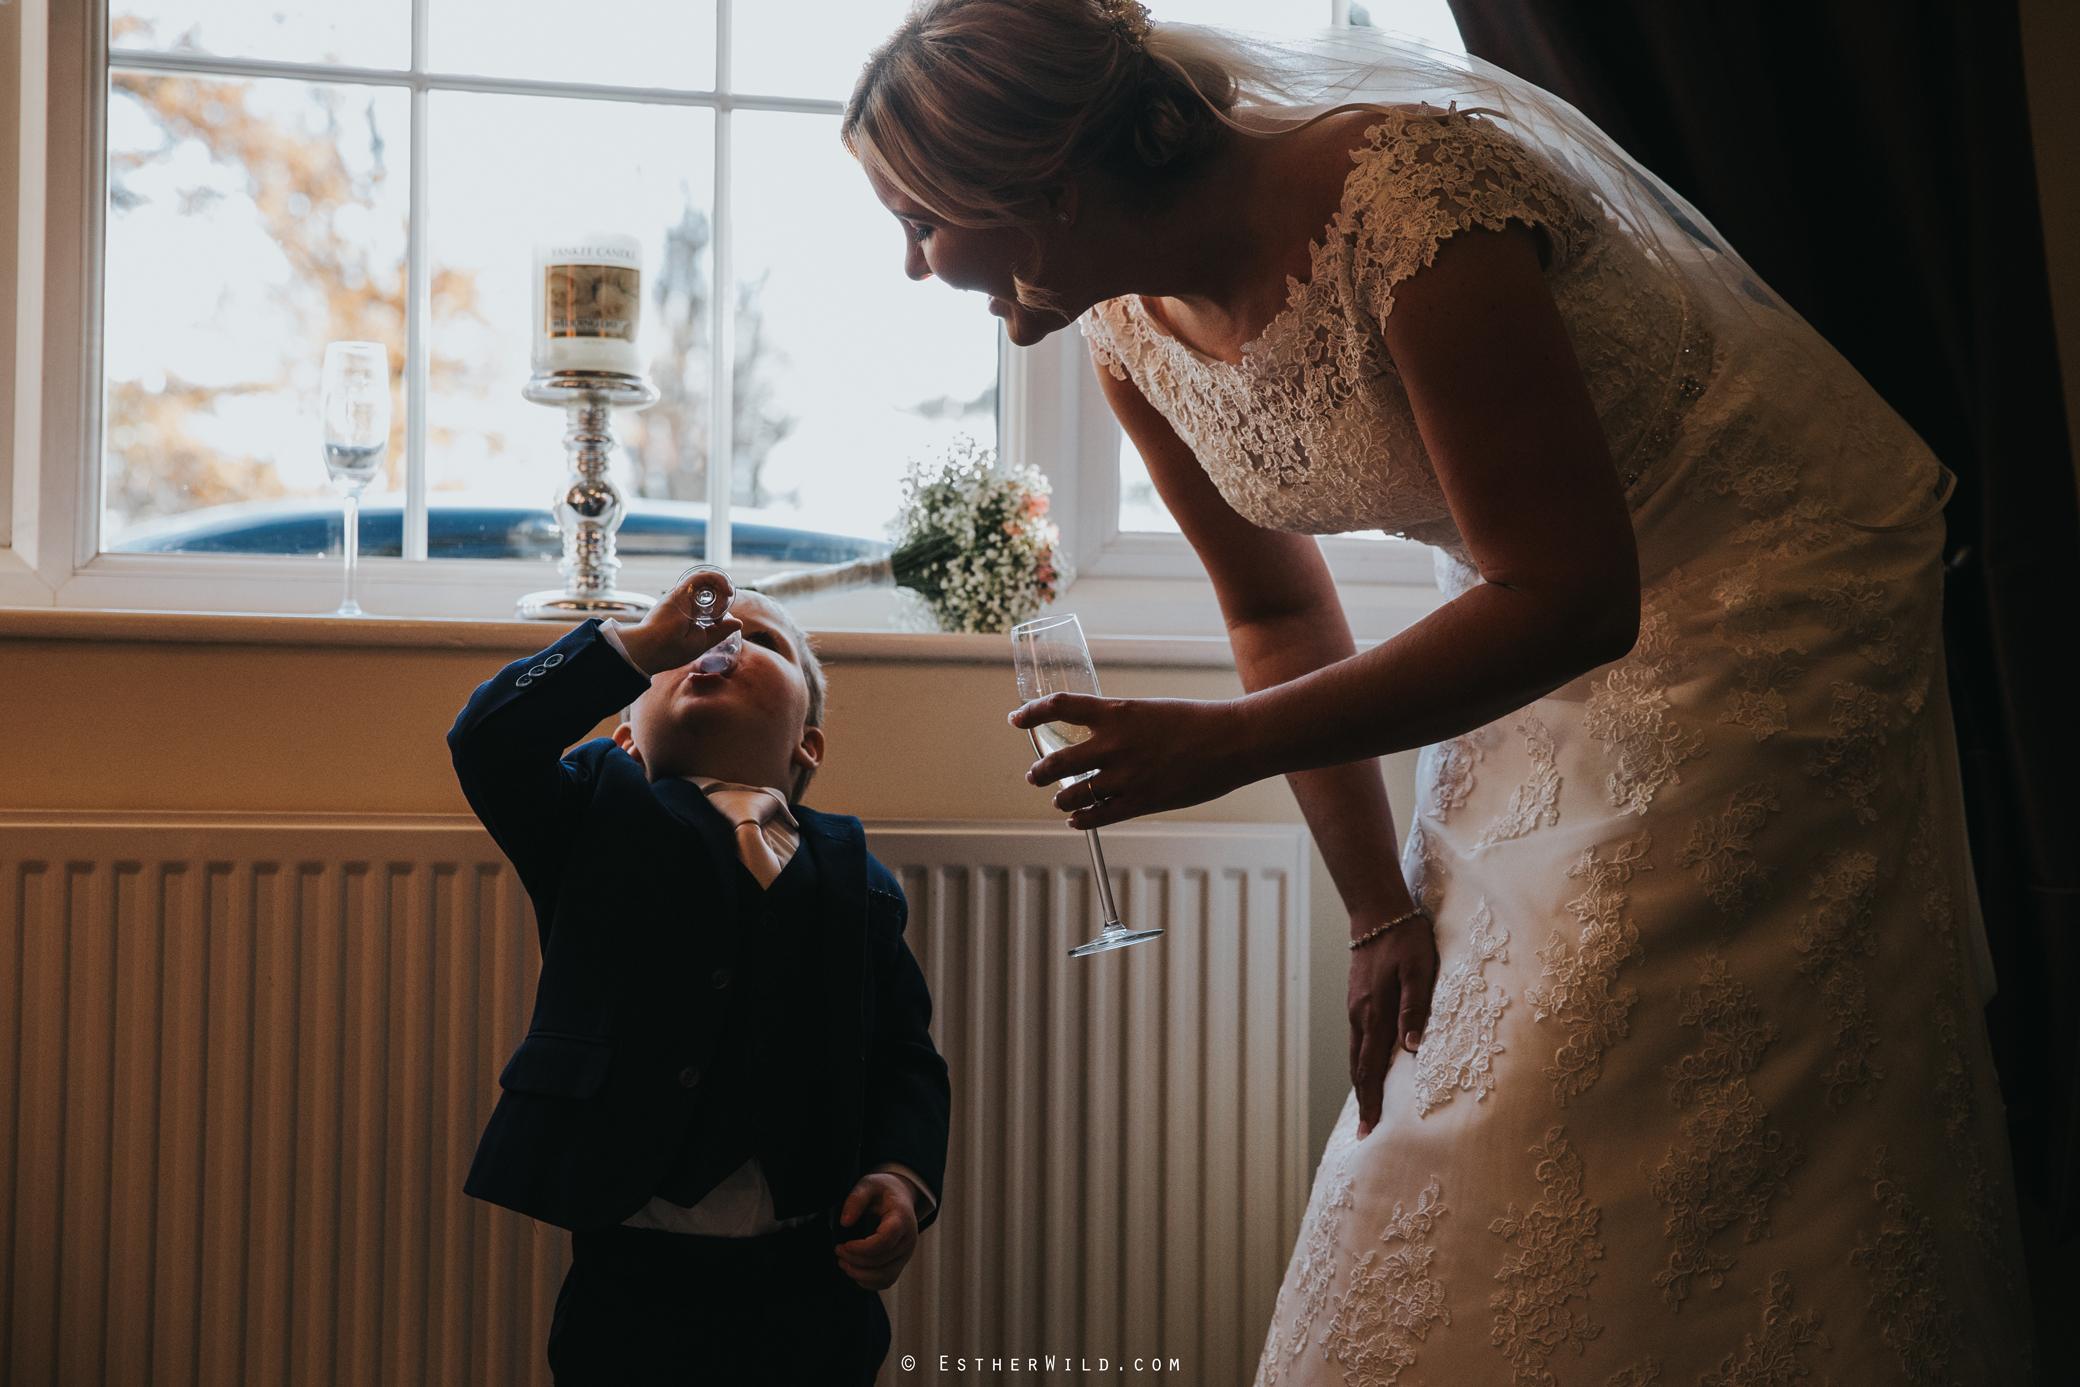 Wedding_Kings_Lynn_Town_Hall_Norfolk_Photographer_Esther_Wild_IMG_0709.jpg